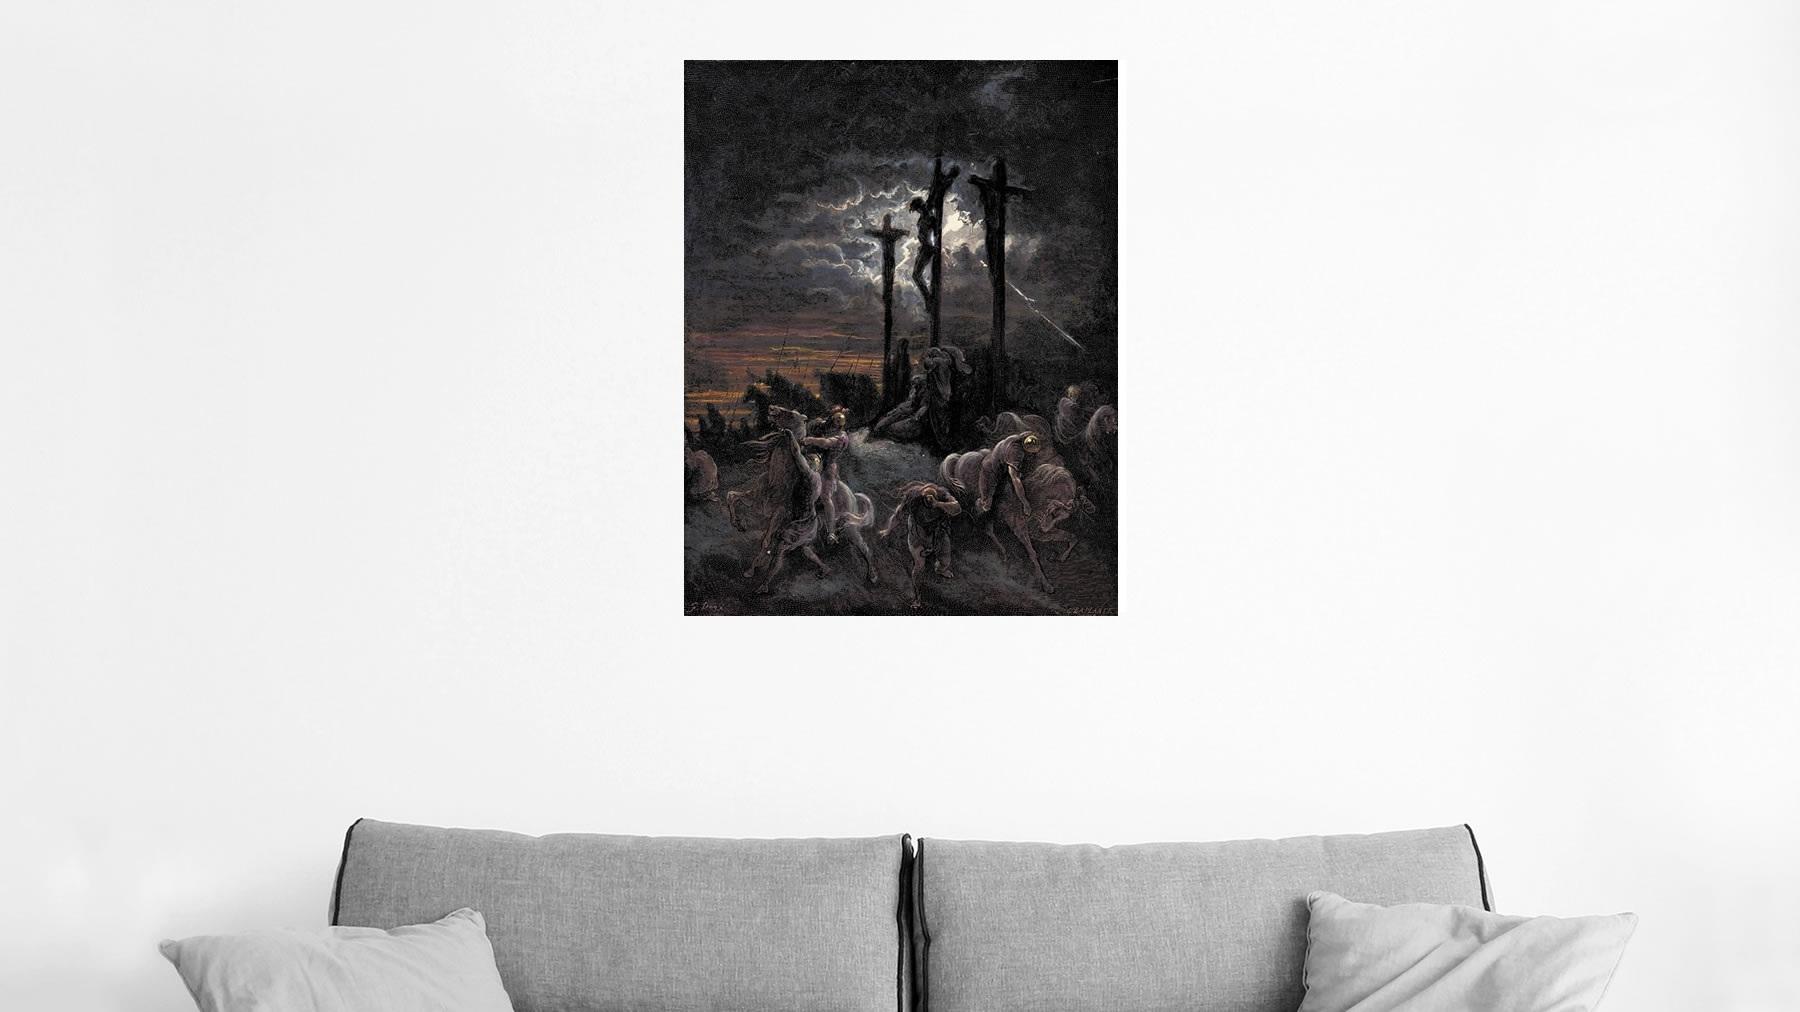 crucifixion_18x24-poster.jpg